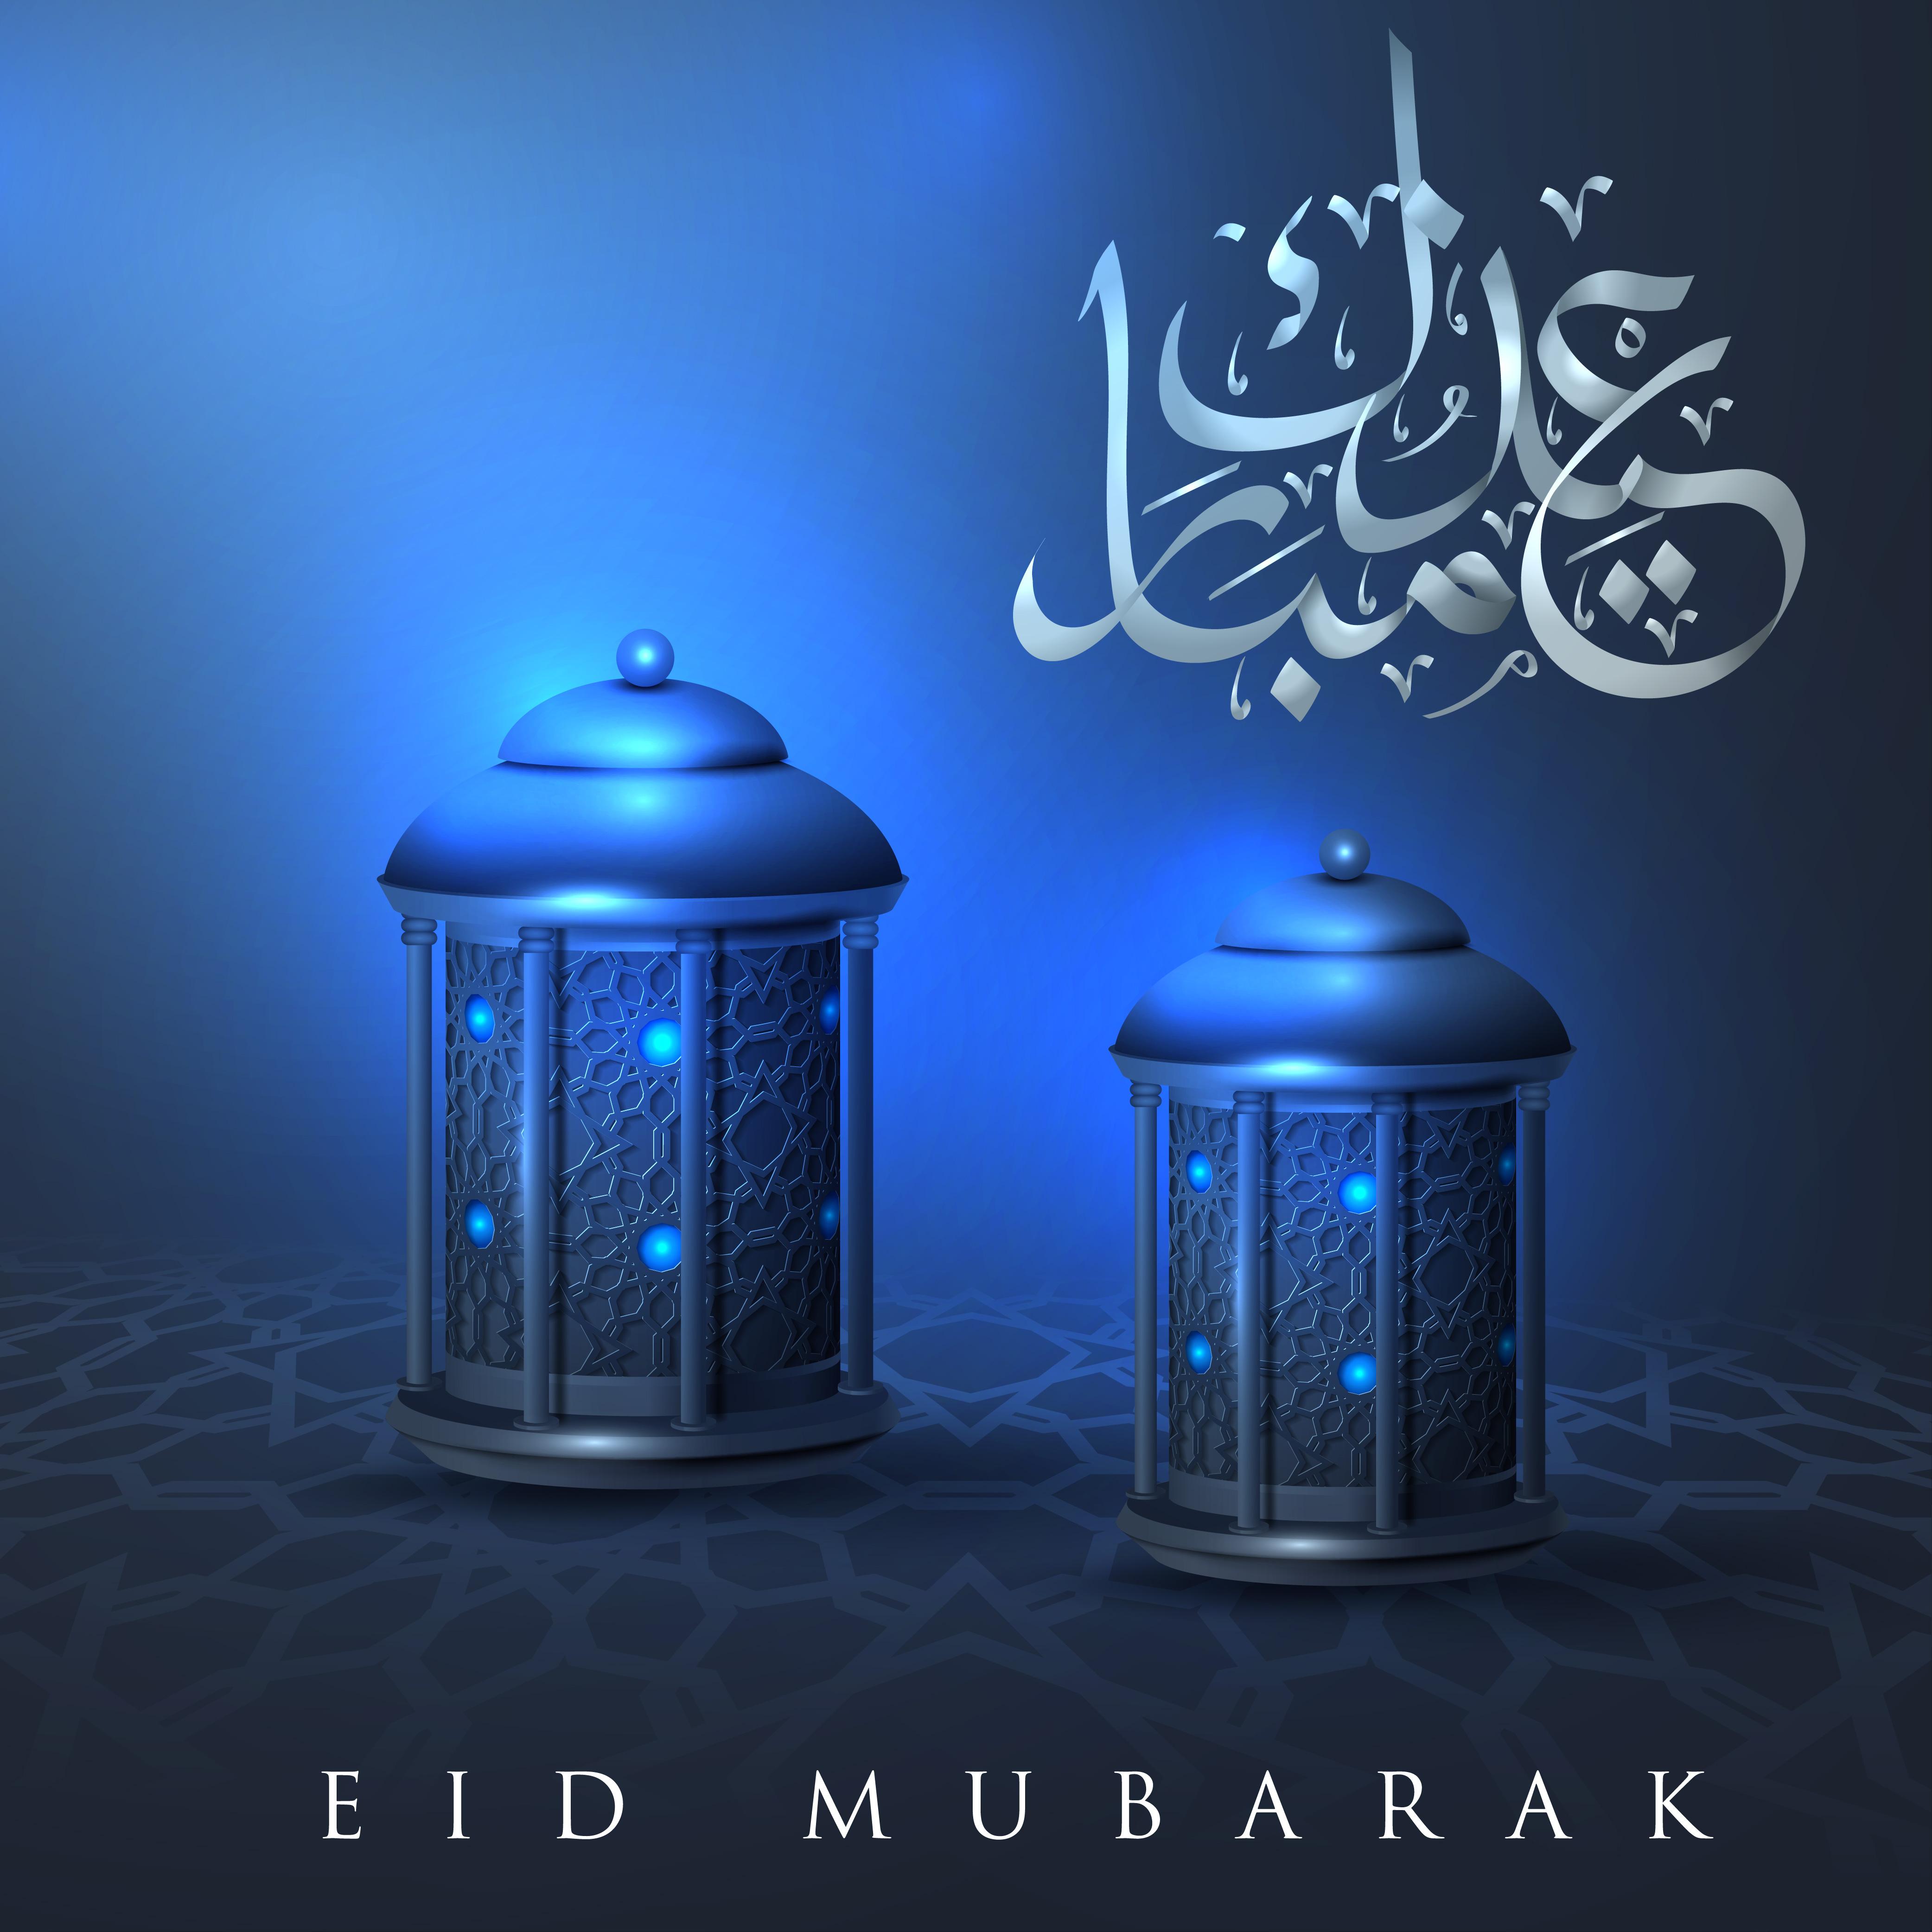 Eid Mubarak Greeting card - Download Free Vectors, Clipart